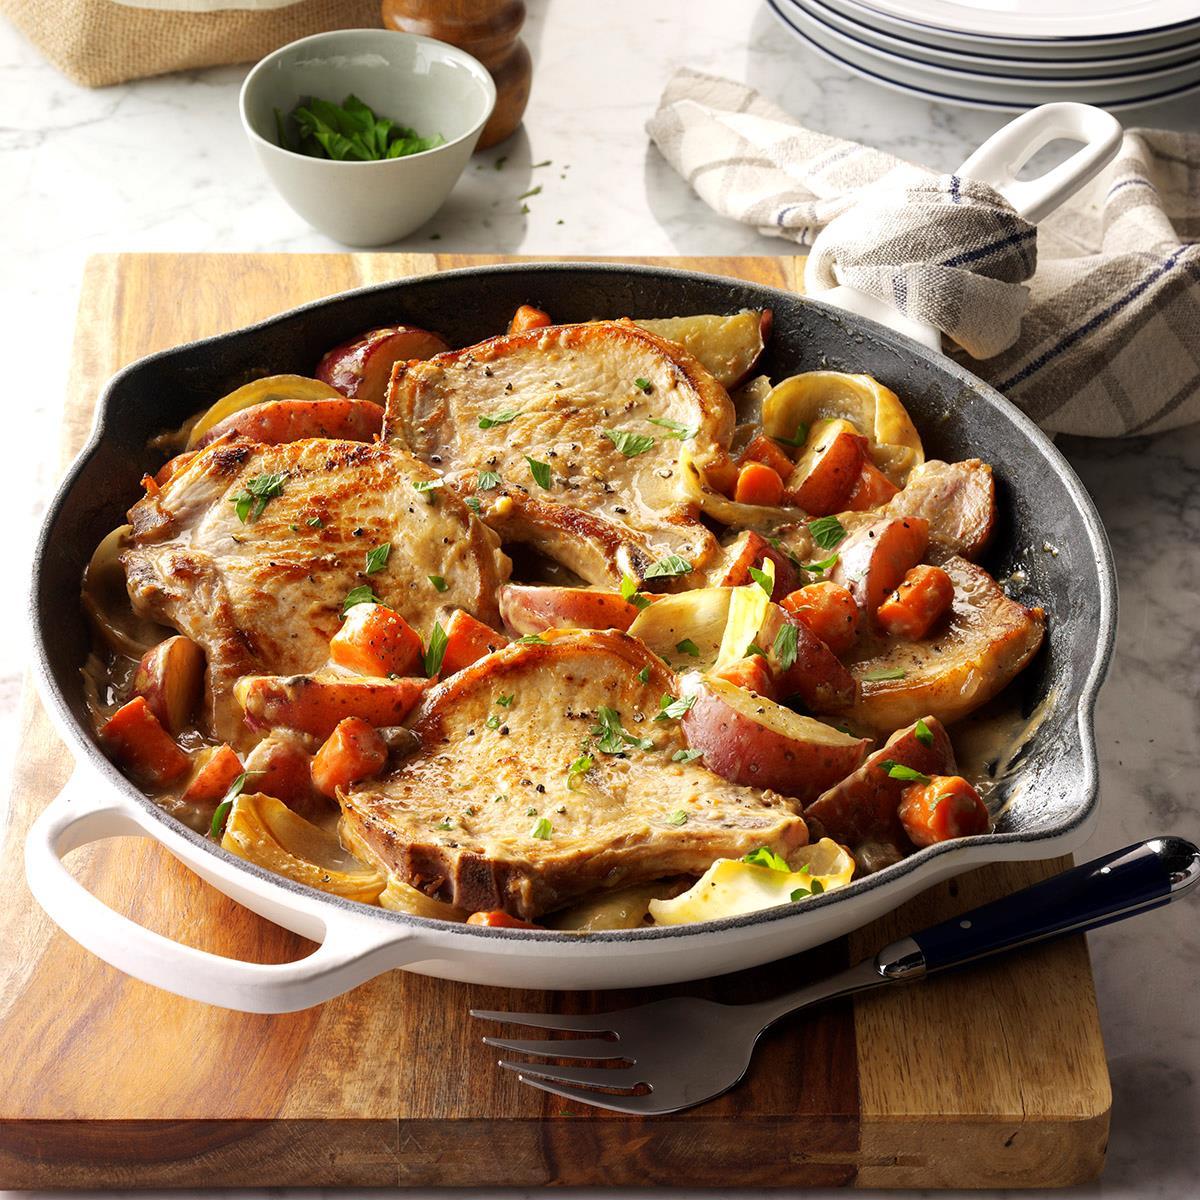 pork chop potato skillet recipe One-Skillet Pork Chop Supper